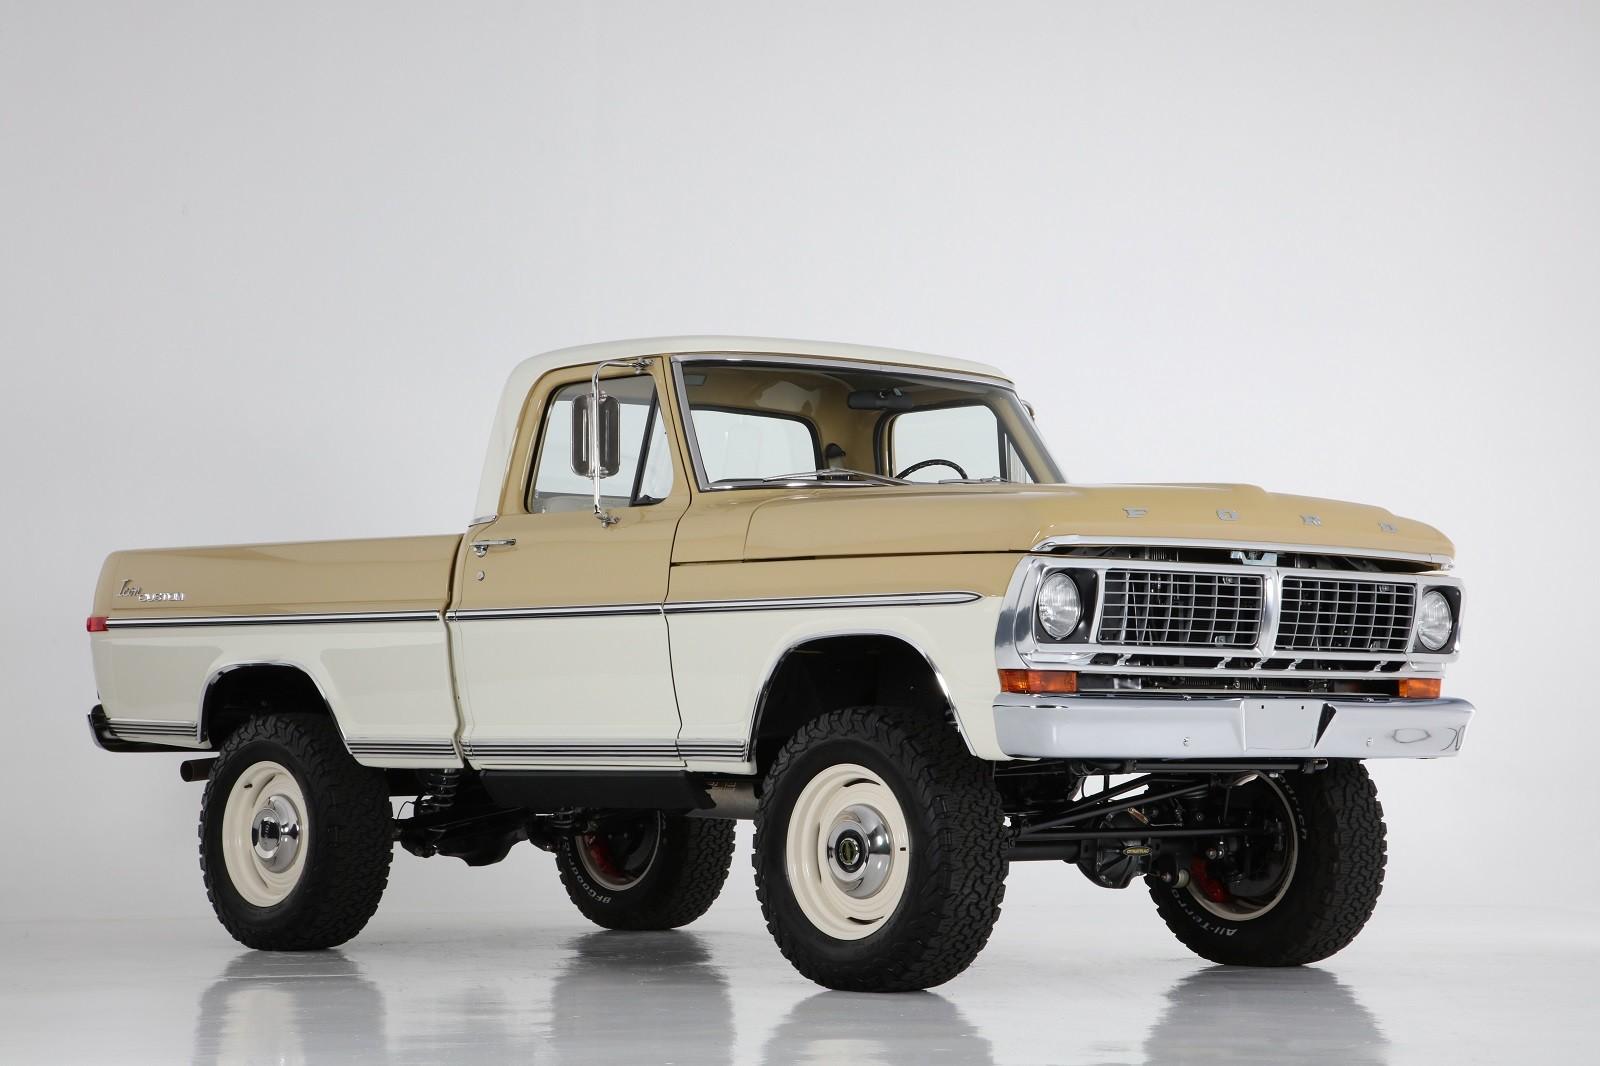 Foto de ICON 4x4 Ranger 1970 Reformer Series (10/38)